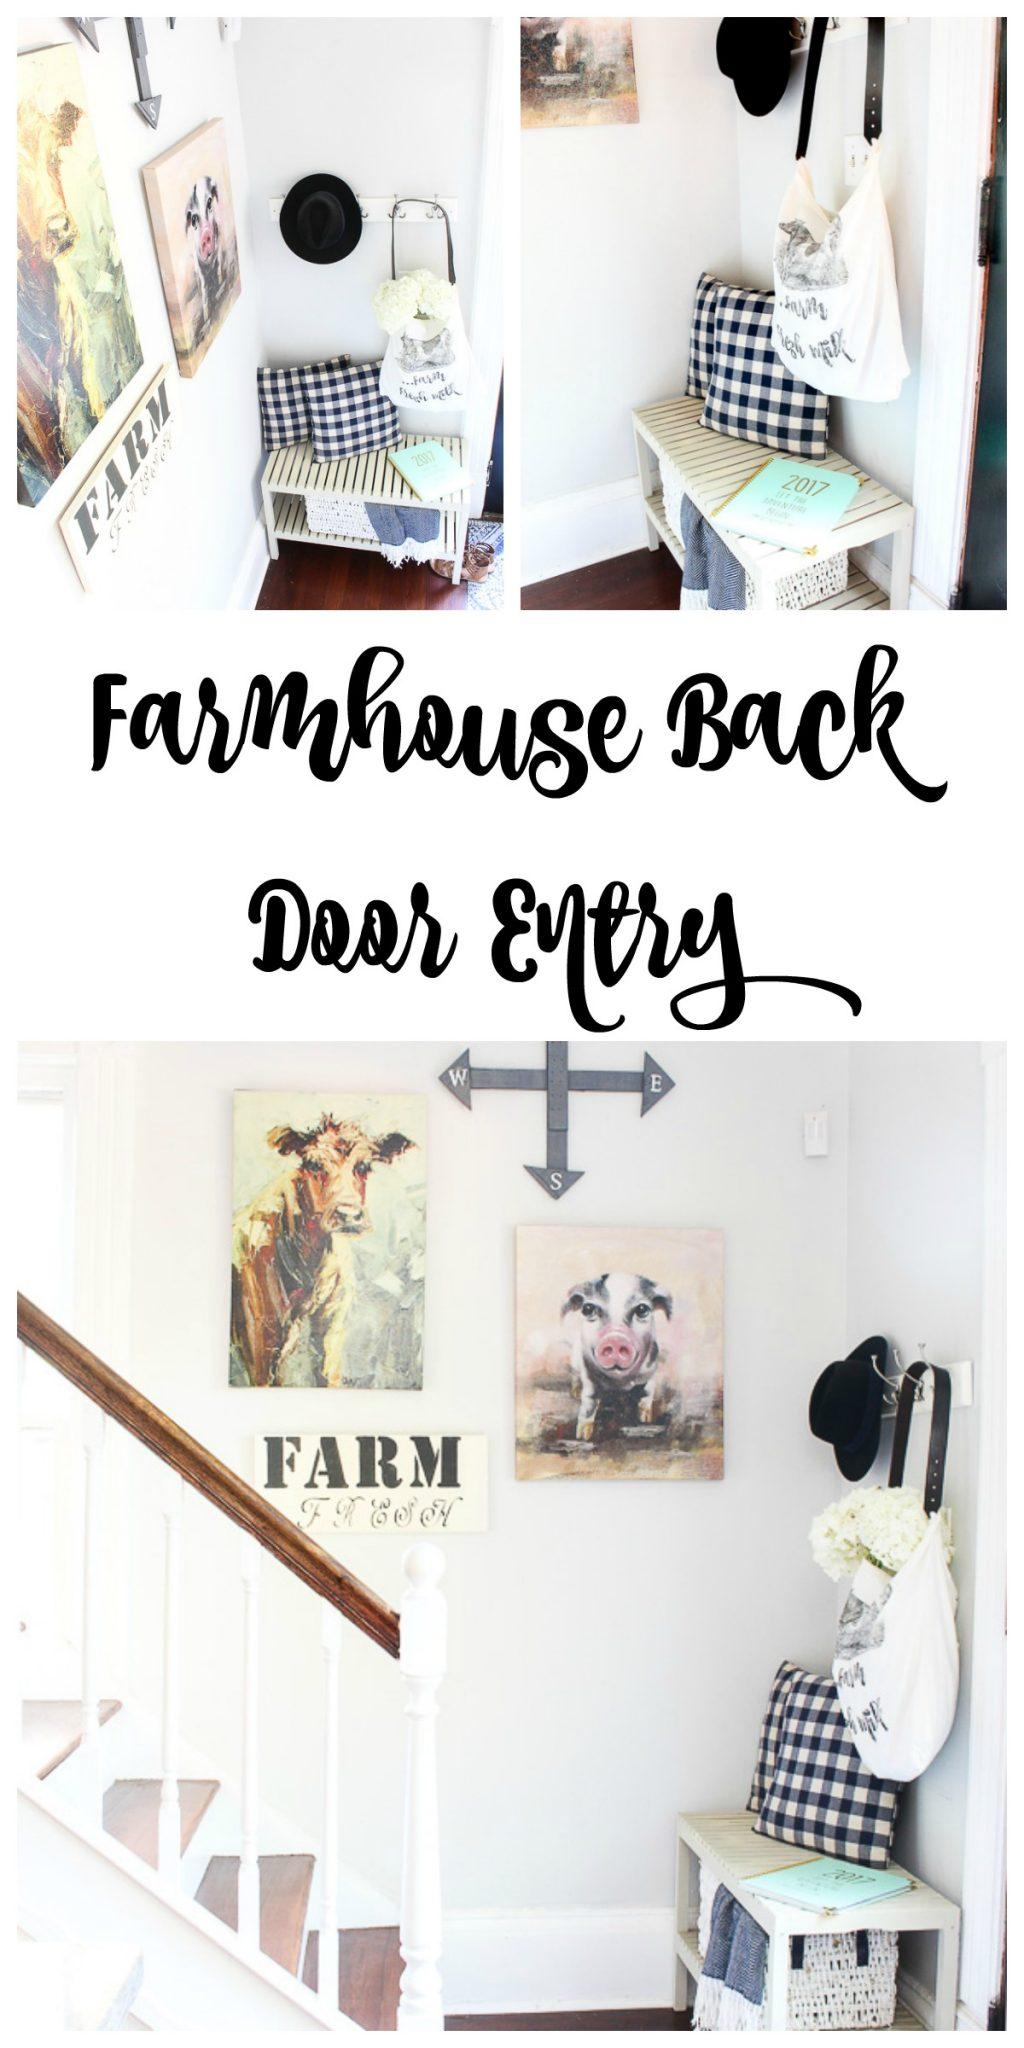 Exceptionnel Farmhouse Decor For Back Door Entry